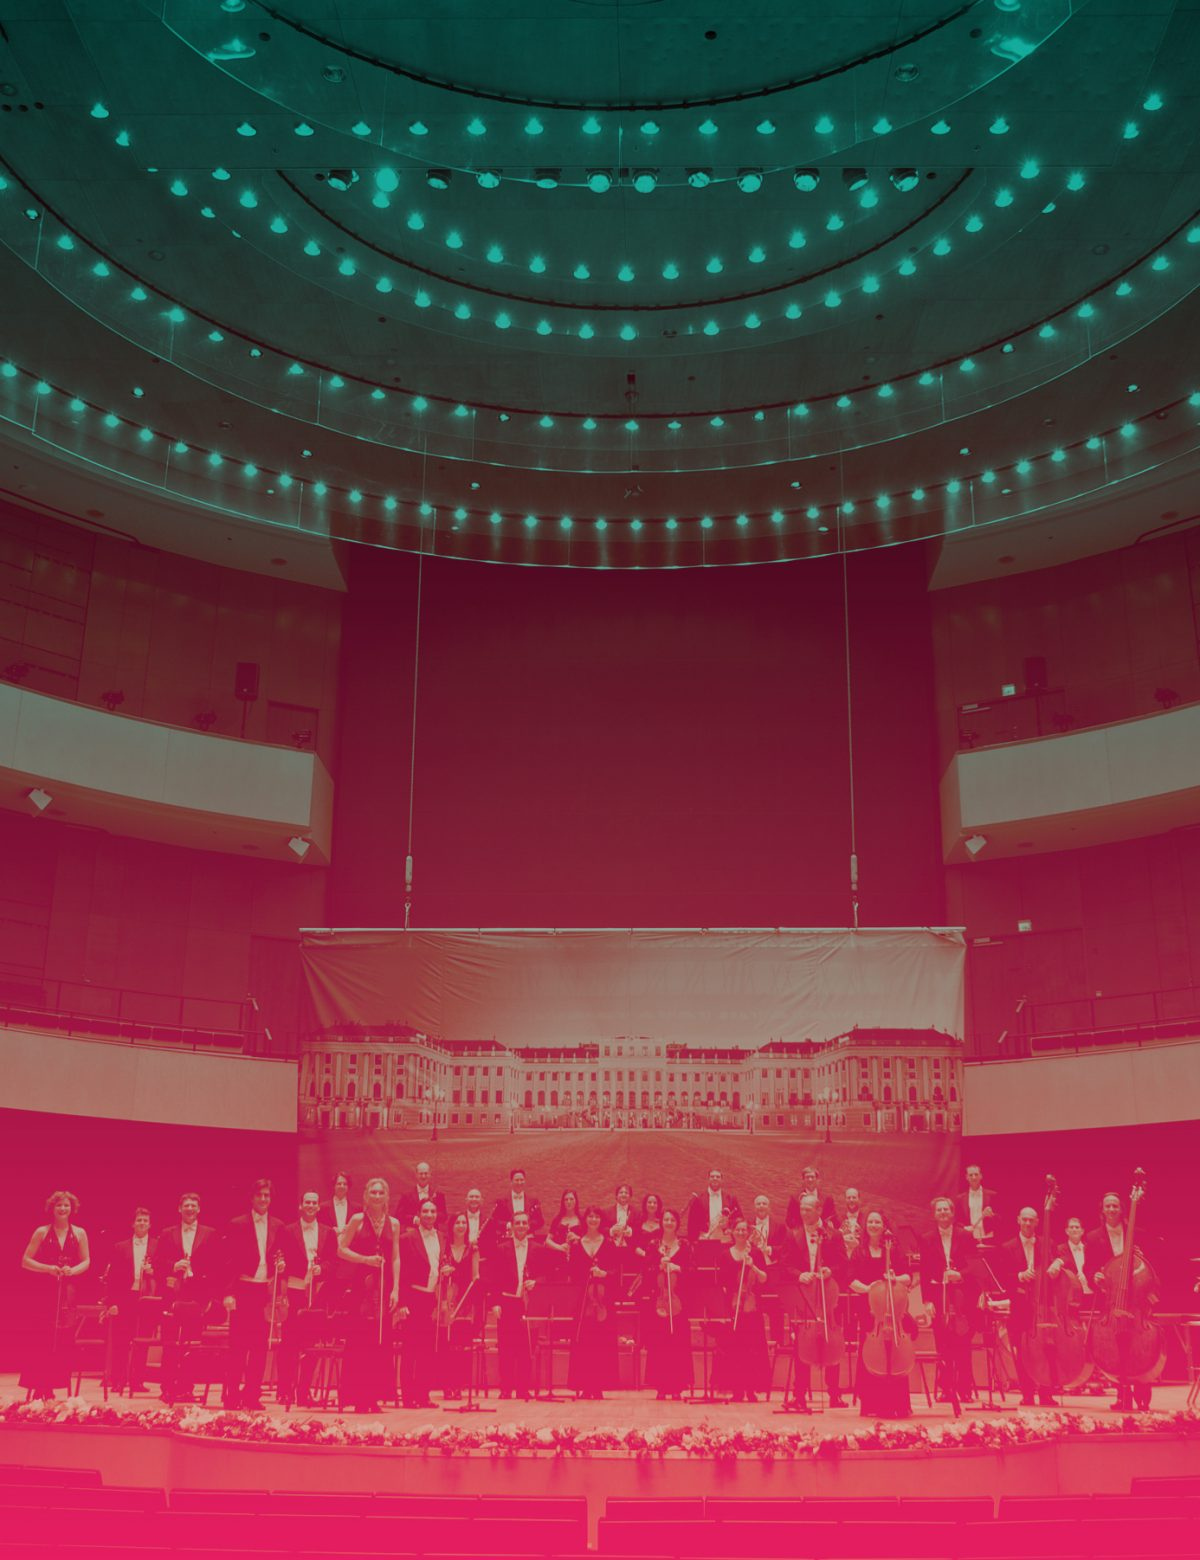 Nyårskonsert 2019 med Schönbrunns slottsensemble,